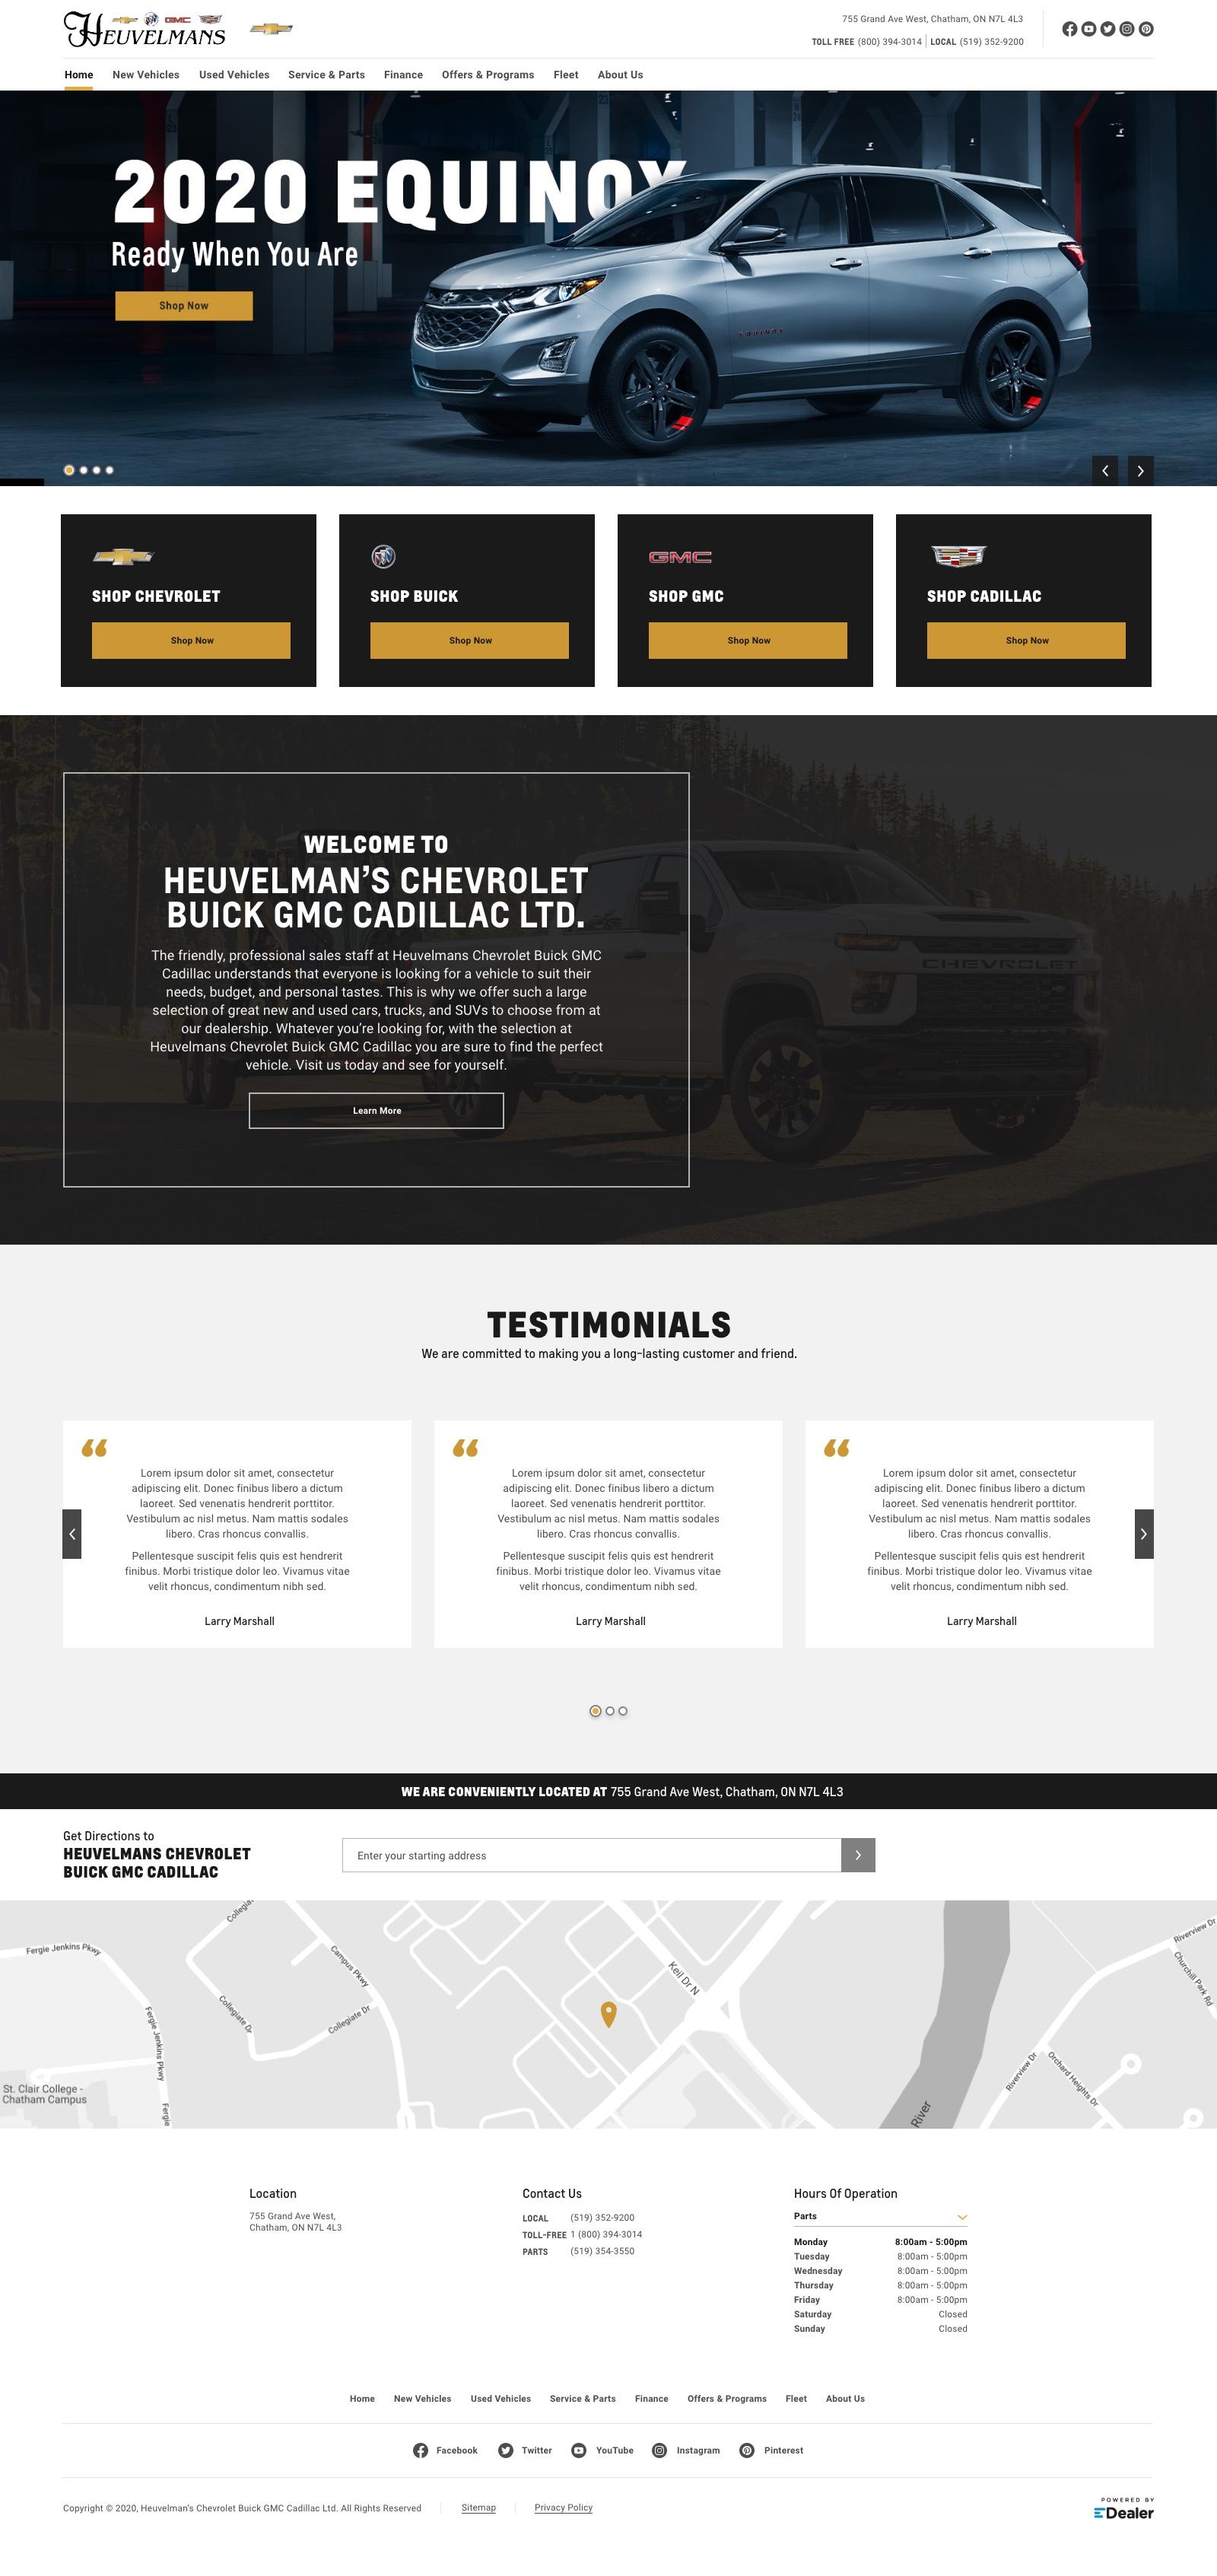 Heuvelmans Chevrolet Buick GMC Cadillac